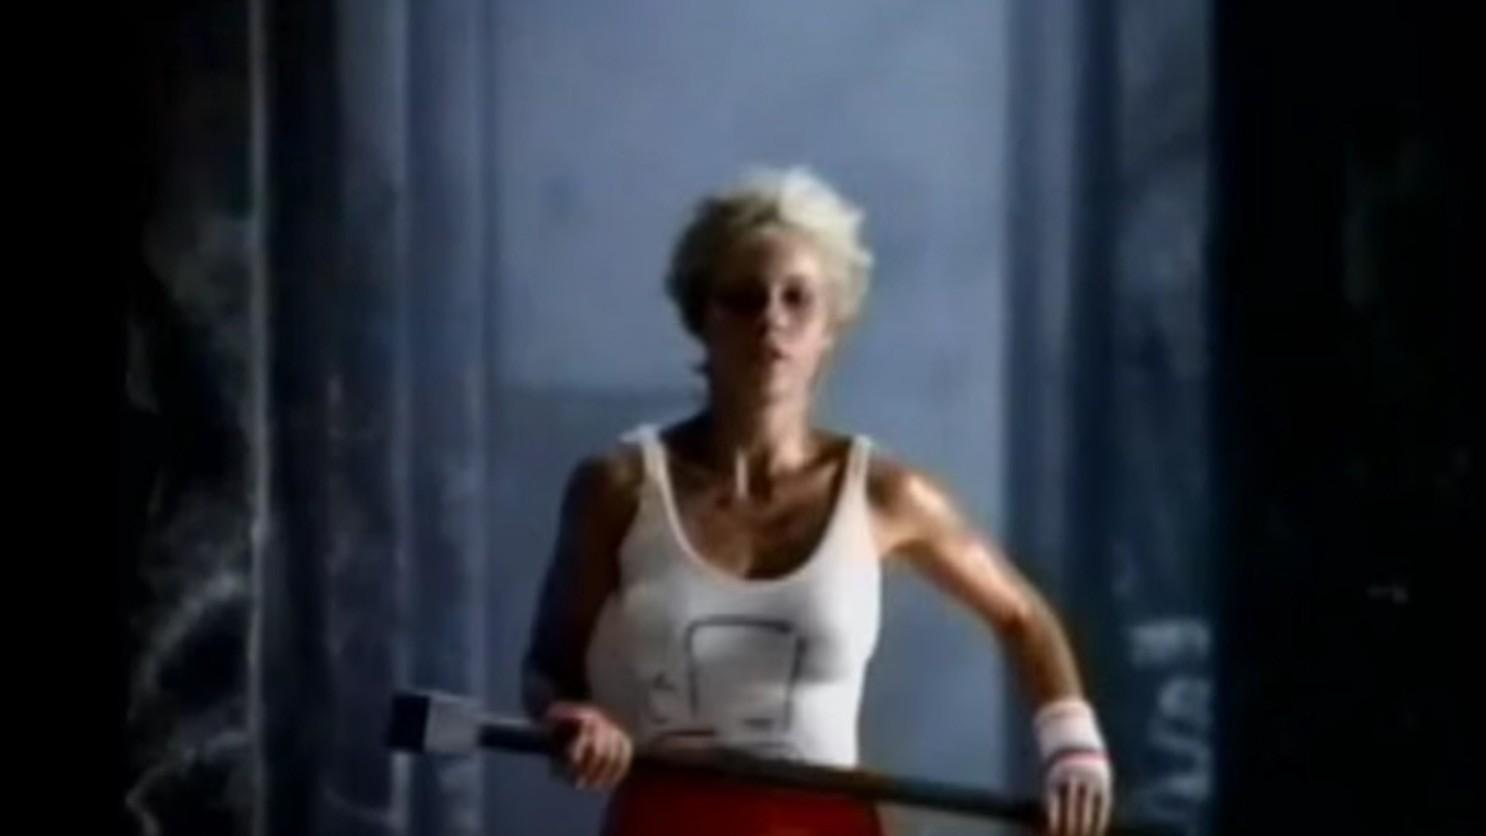 A female Olympian runs wielding a hammer